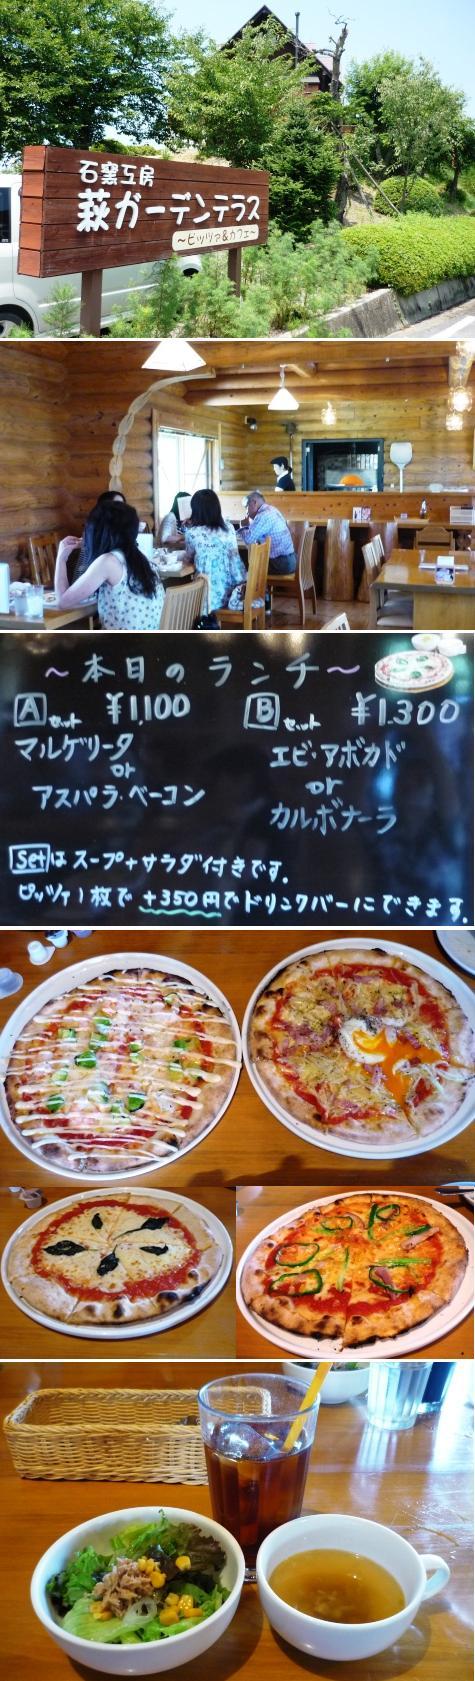 aピザP1180605